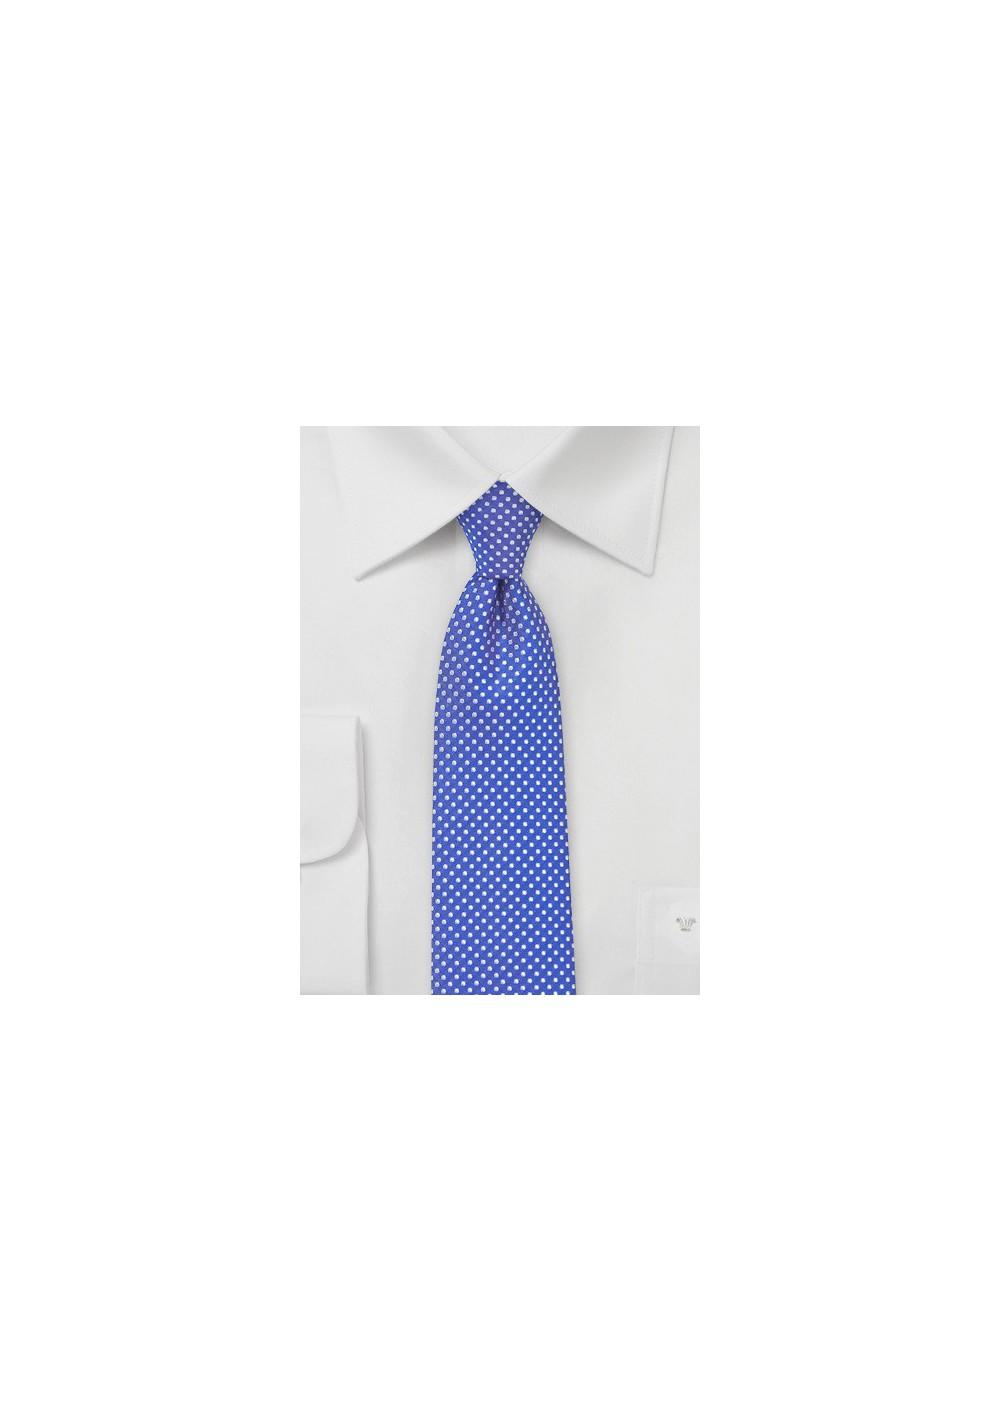 Horizon Blue Pin Dot Tie in Skinny Width